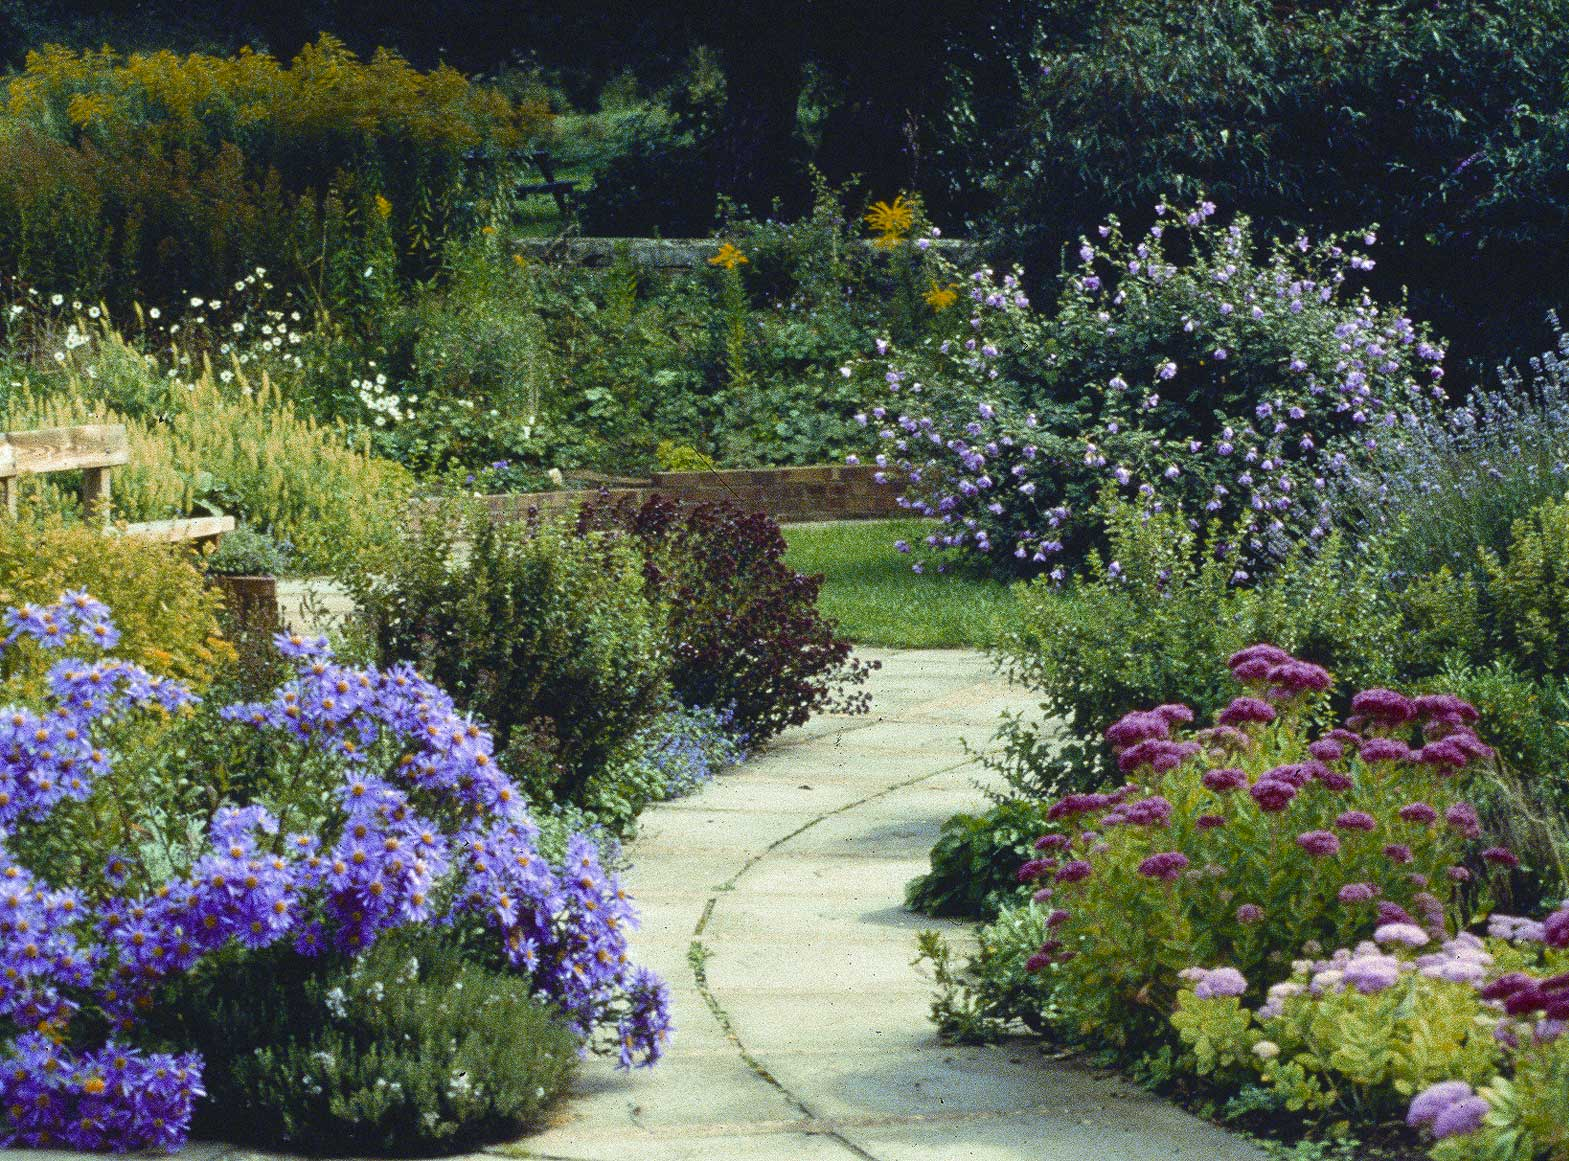 Small butterfly garden ideas photograph sunday 17 februar for Butterfly garden designs free